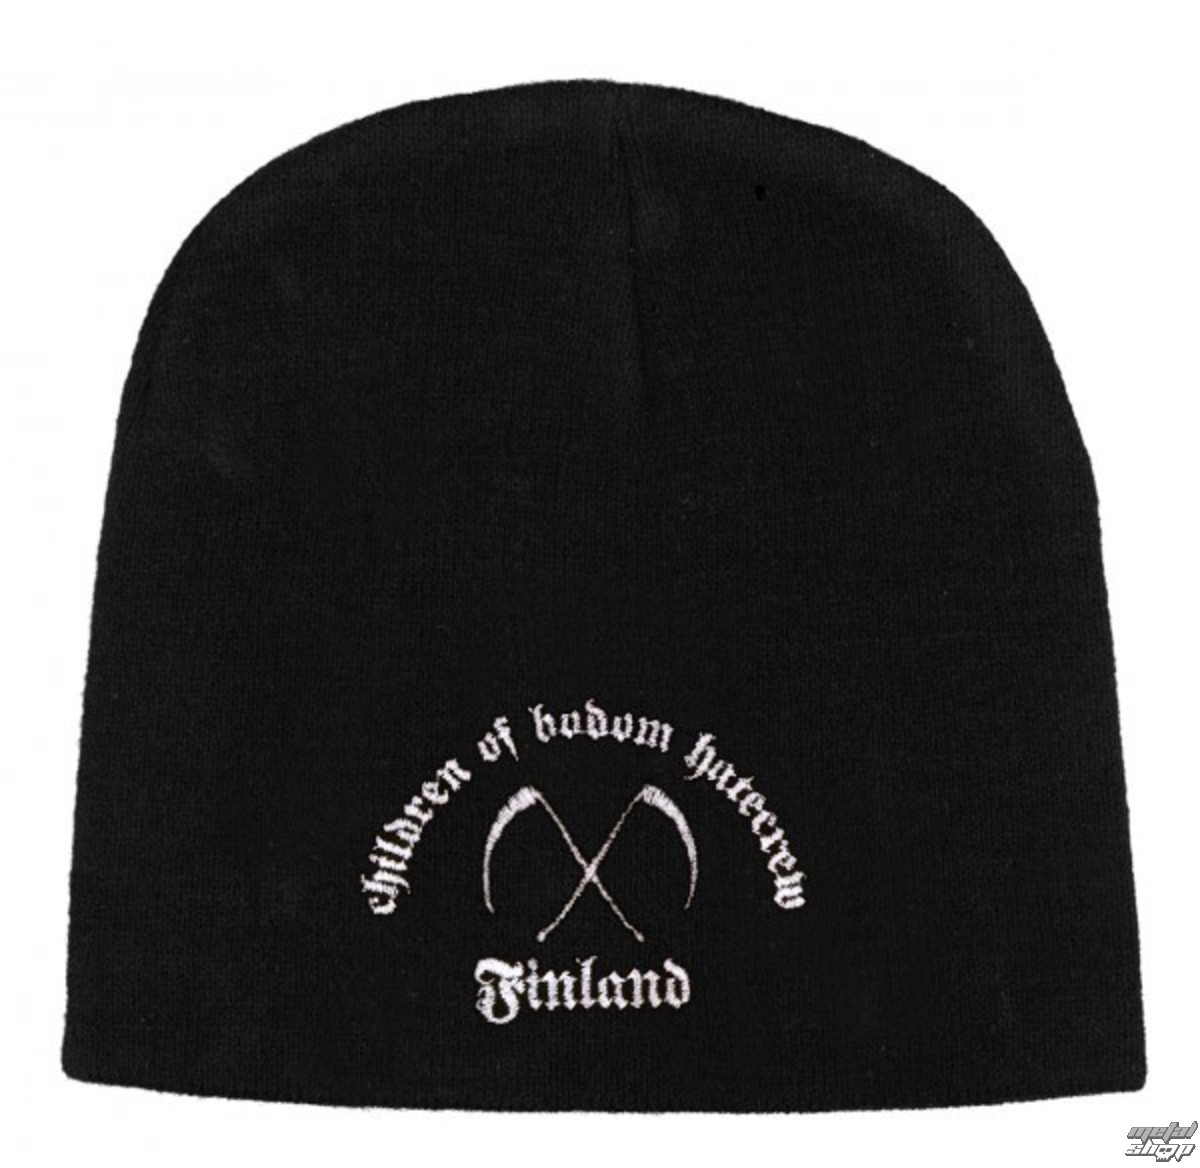 "kulich Children of Bodom ""Hatecrew/Finland"" - RAZAMATAZ - BH001"